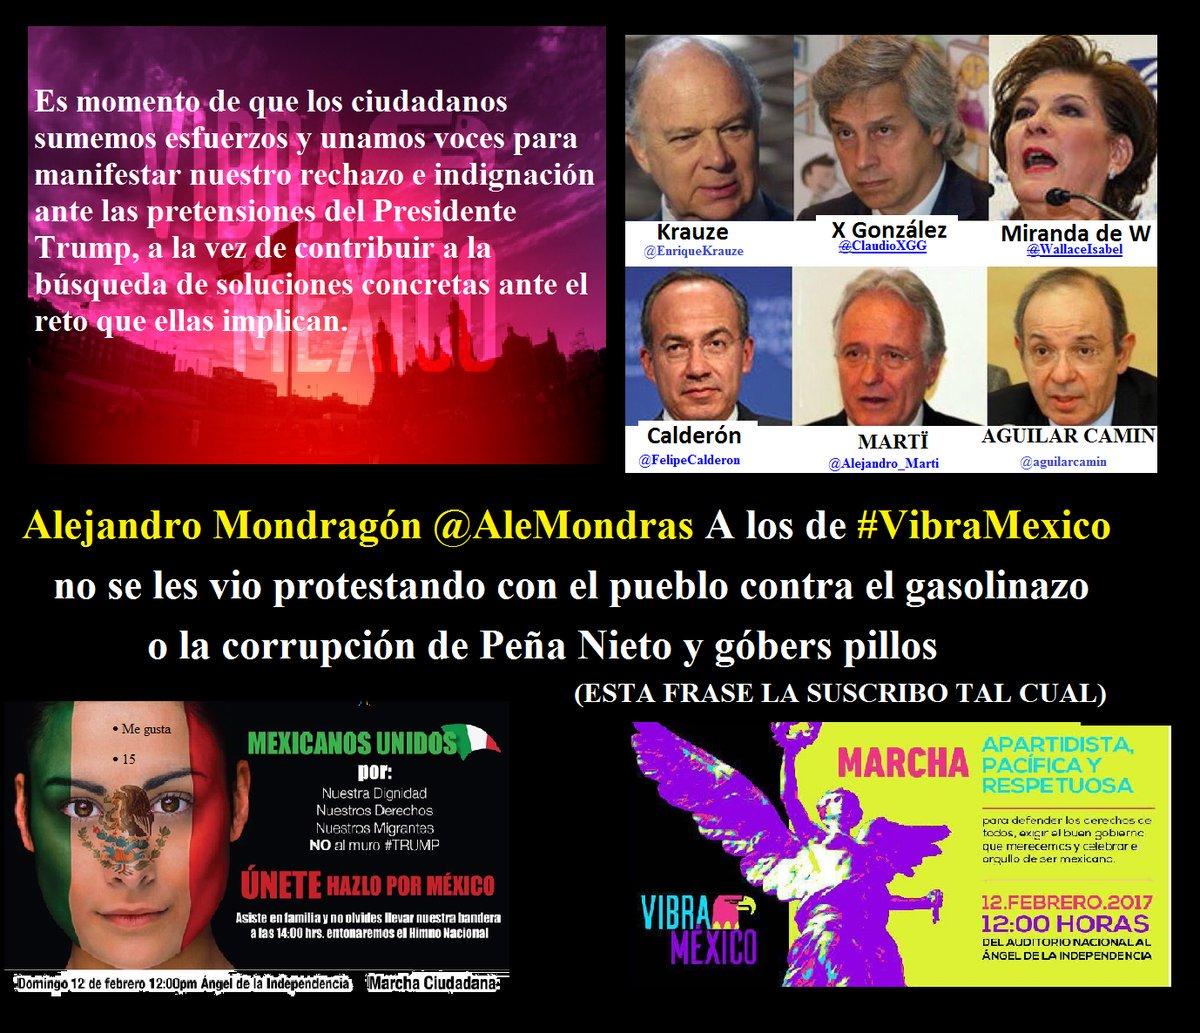 Ambas marchas son percibidas como en apoyo a Peña. FOTO: Twitter @AleMondras